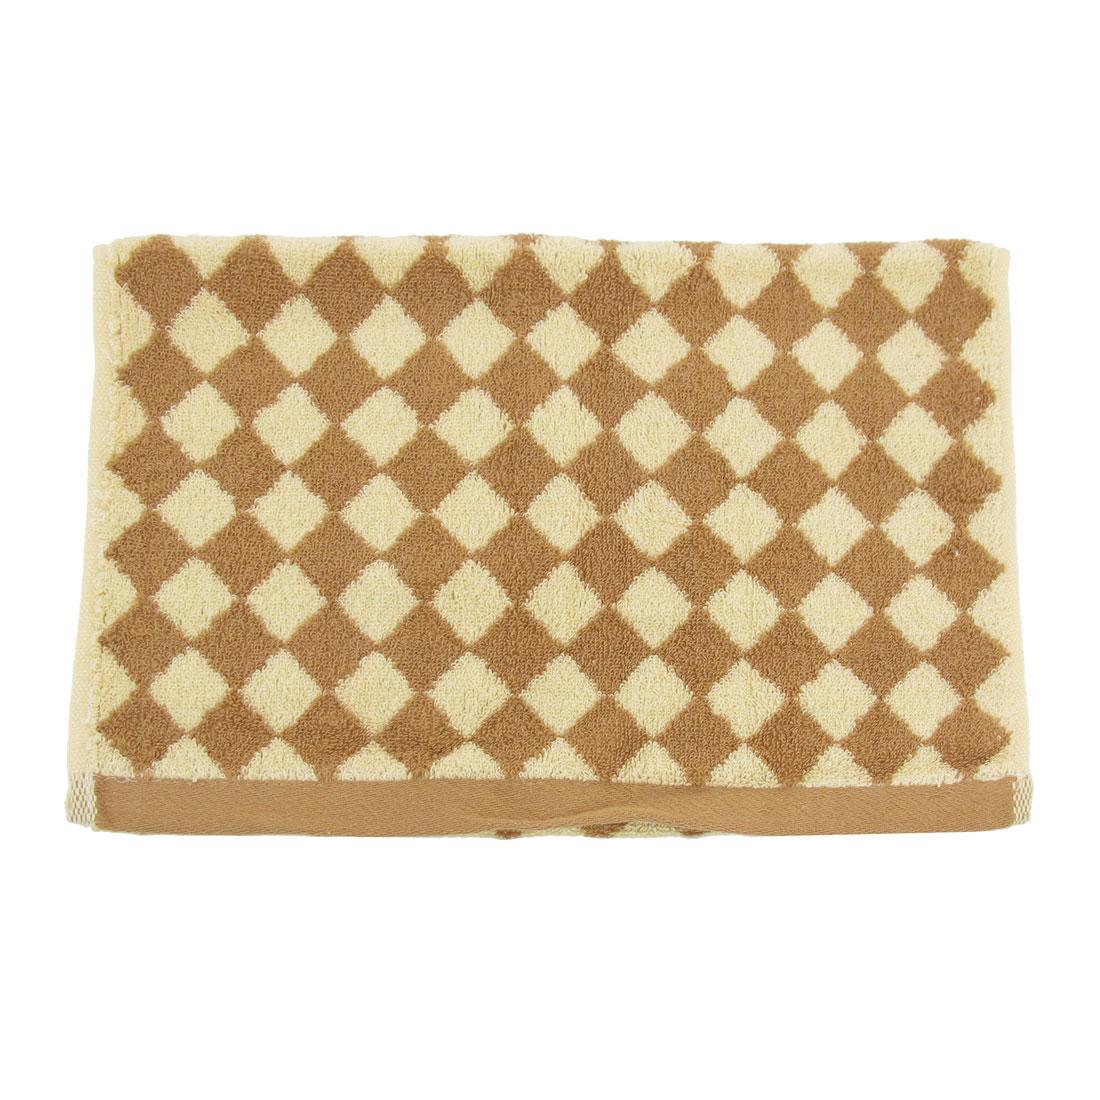 Yellow Brown Rhombic Check Pattern Rectangular Soft Towel Washcloth